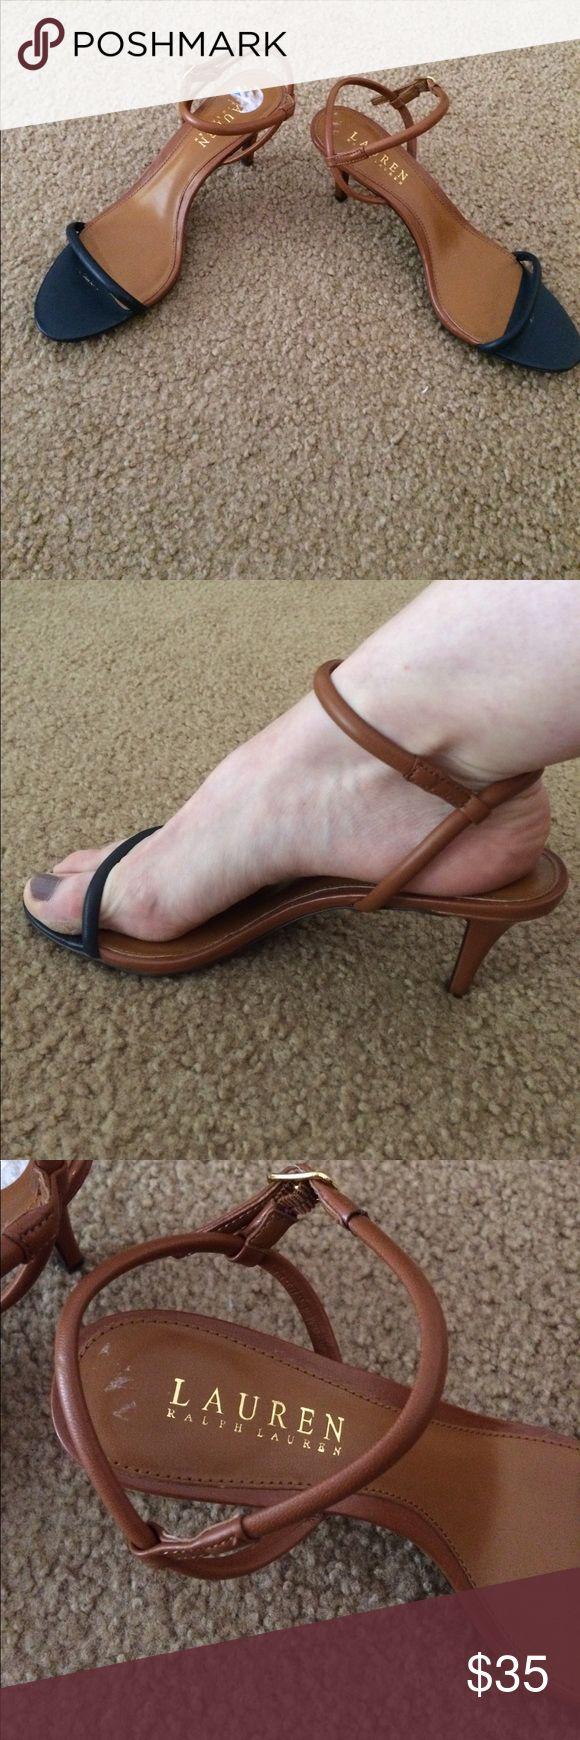 Tan and Navy Strappy Heels Classy heels by Lauren Ralph Lauren. Only flaw is residue from sales sticker, not visible when wearing. 3 inch heel. Runs just a little small. Fits between a 6 and 6.5 Lauren Ralph Lauren Shoes Heels